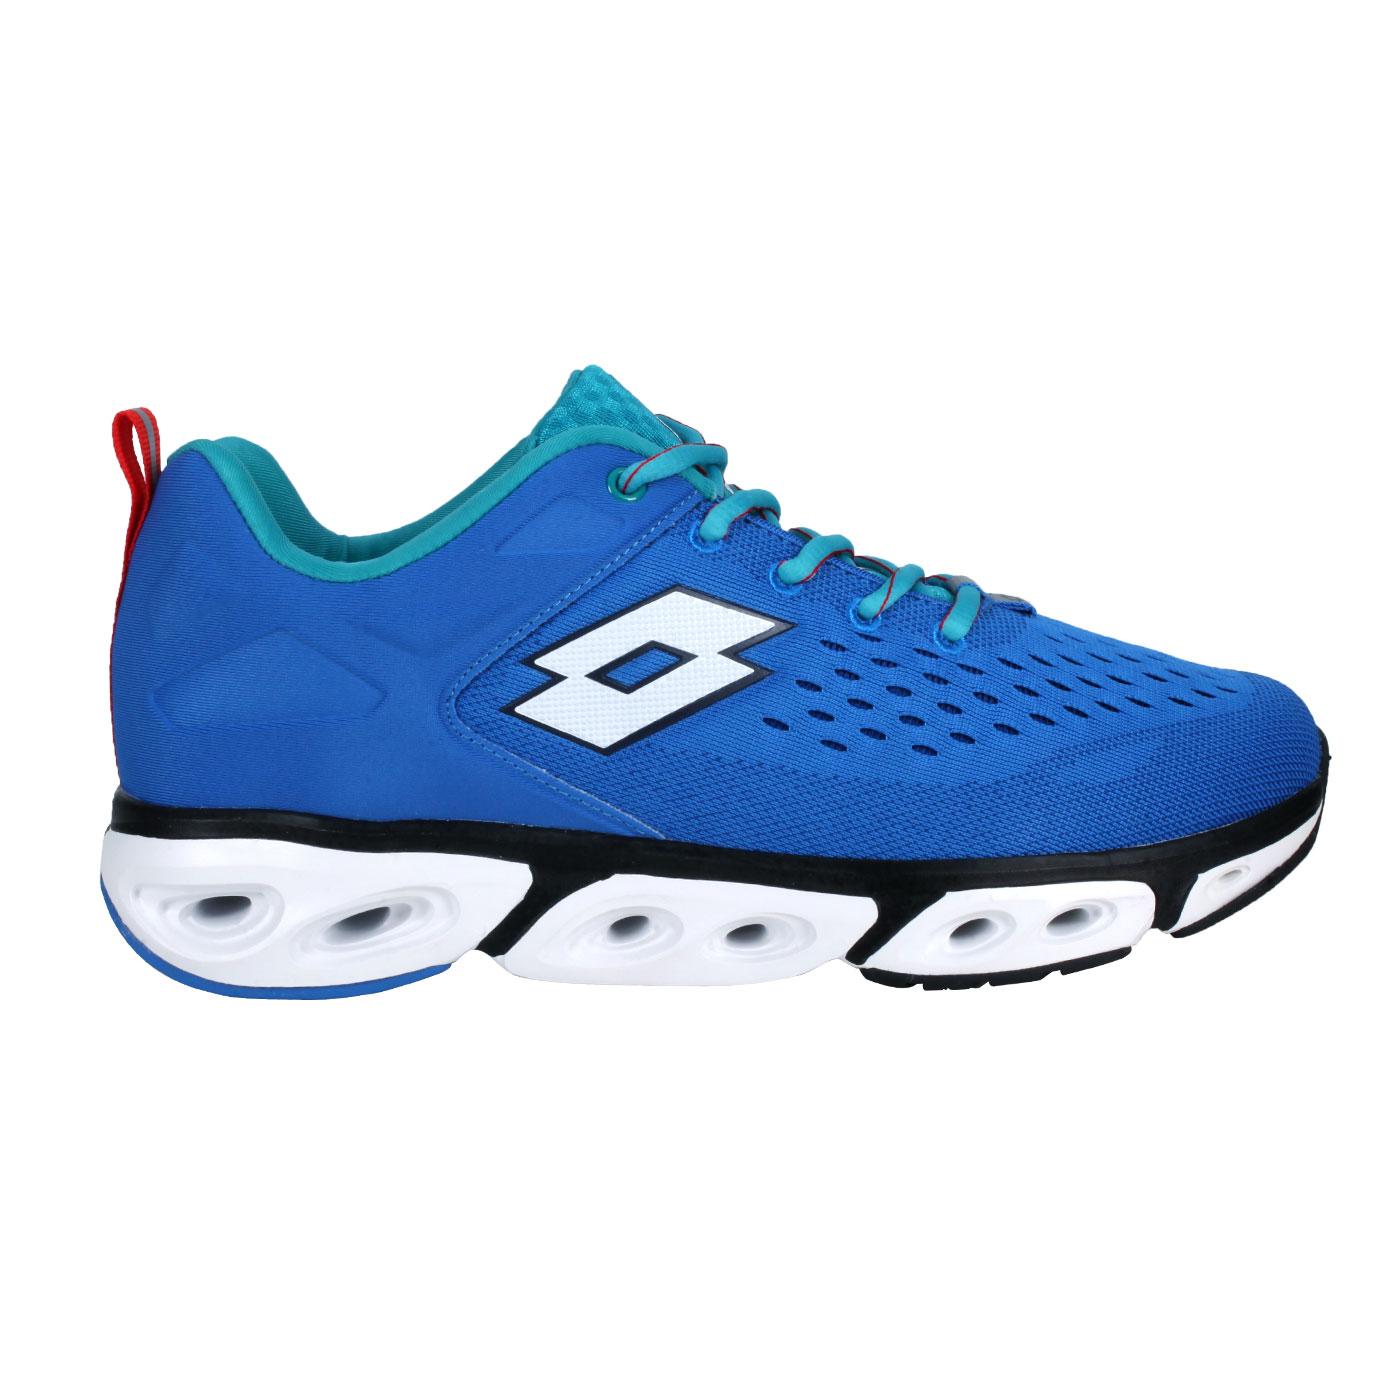 LOTTO 男款風動運動鞋 LT1AMR3596 - 藍綠白